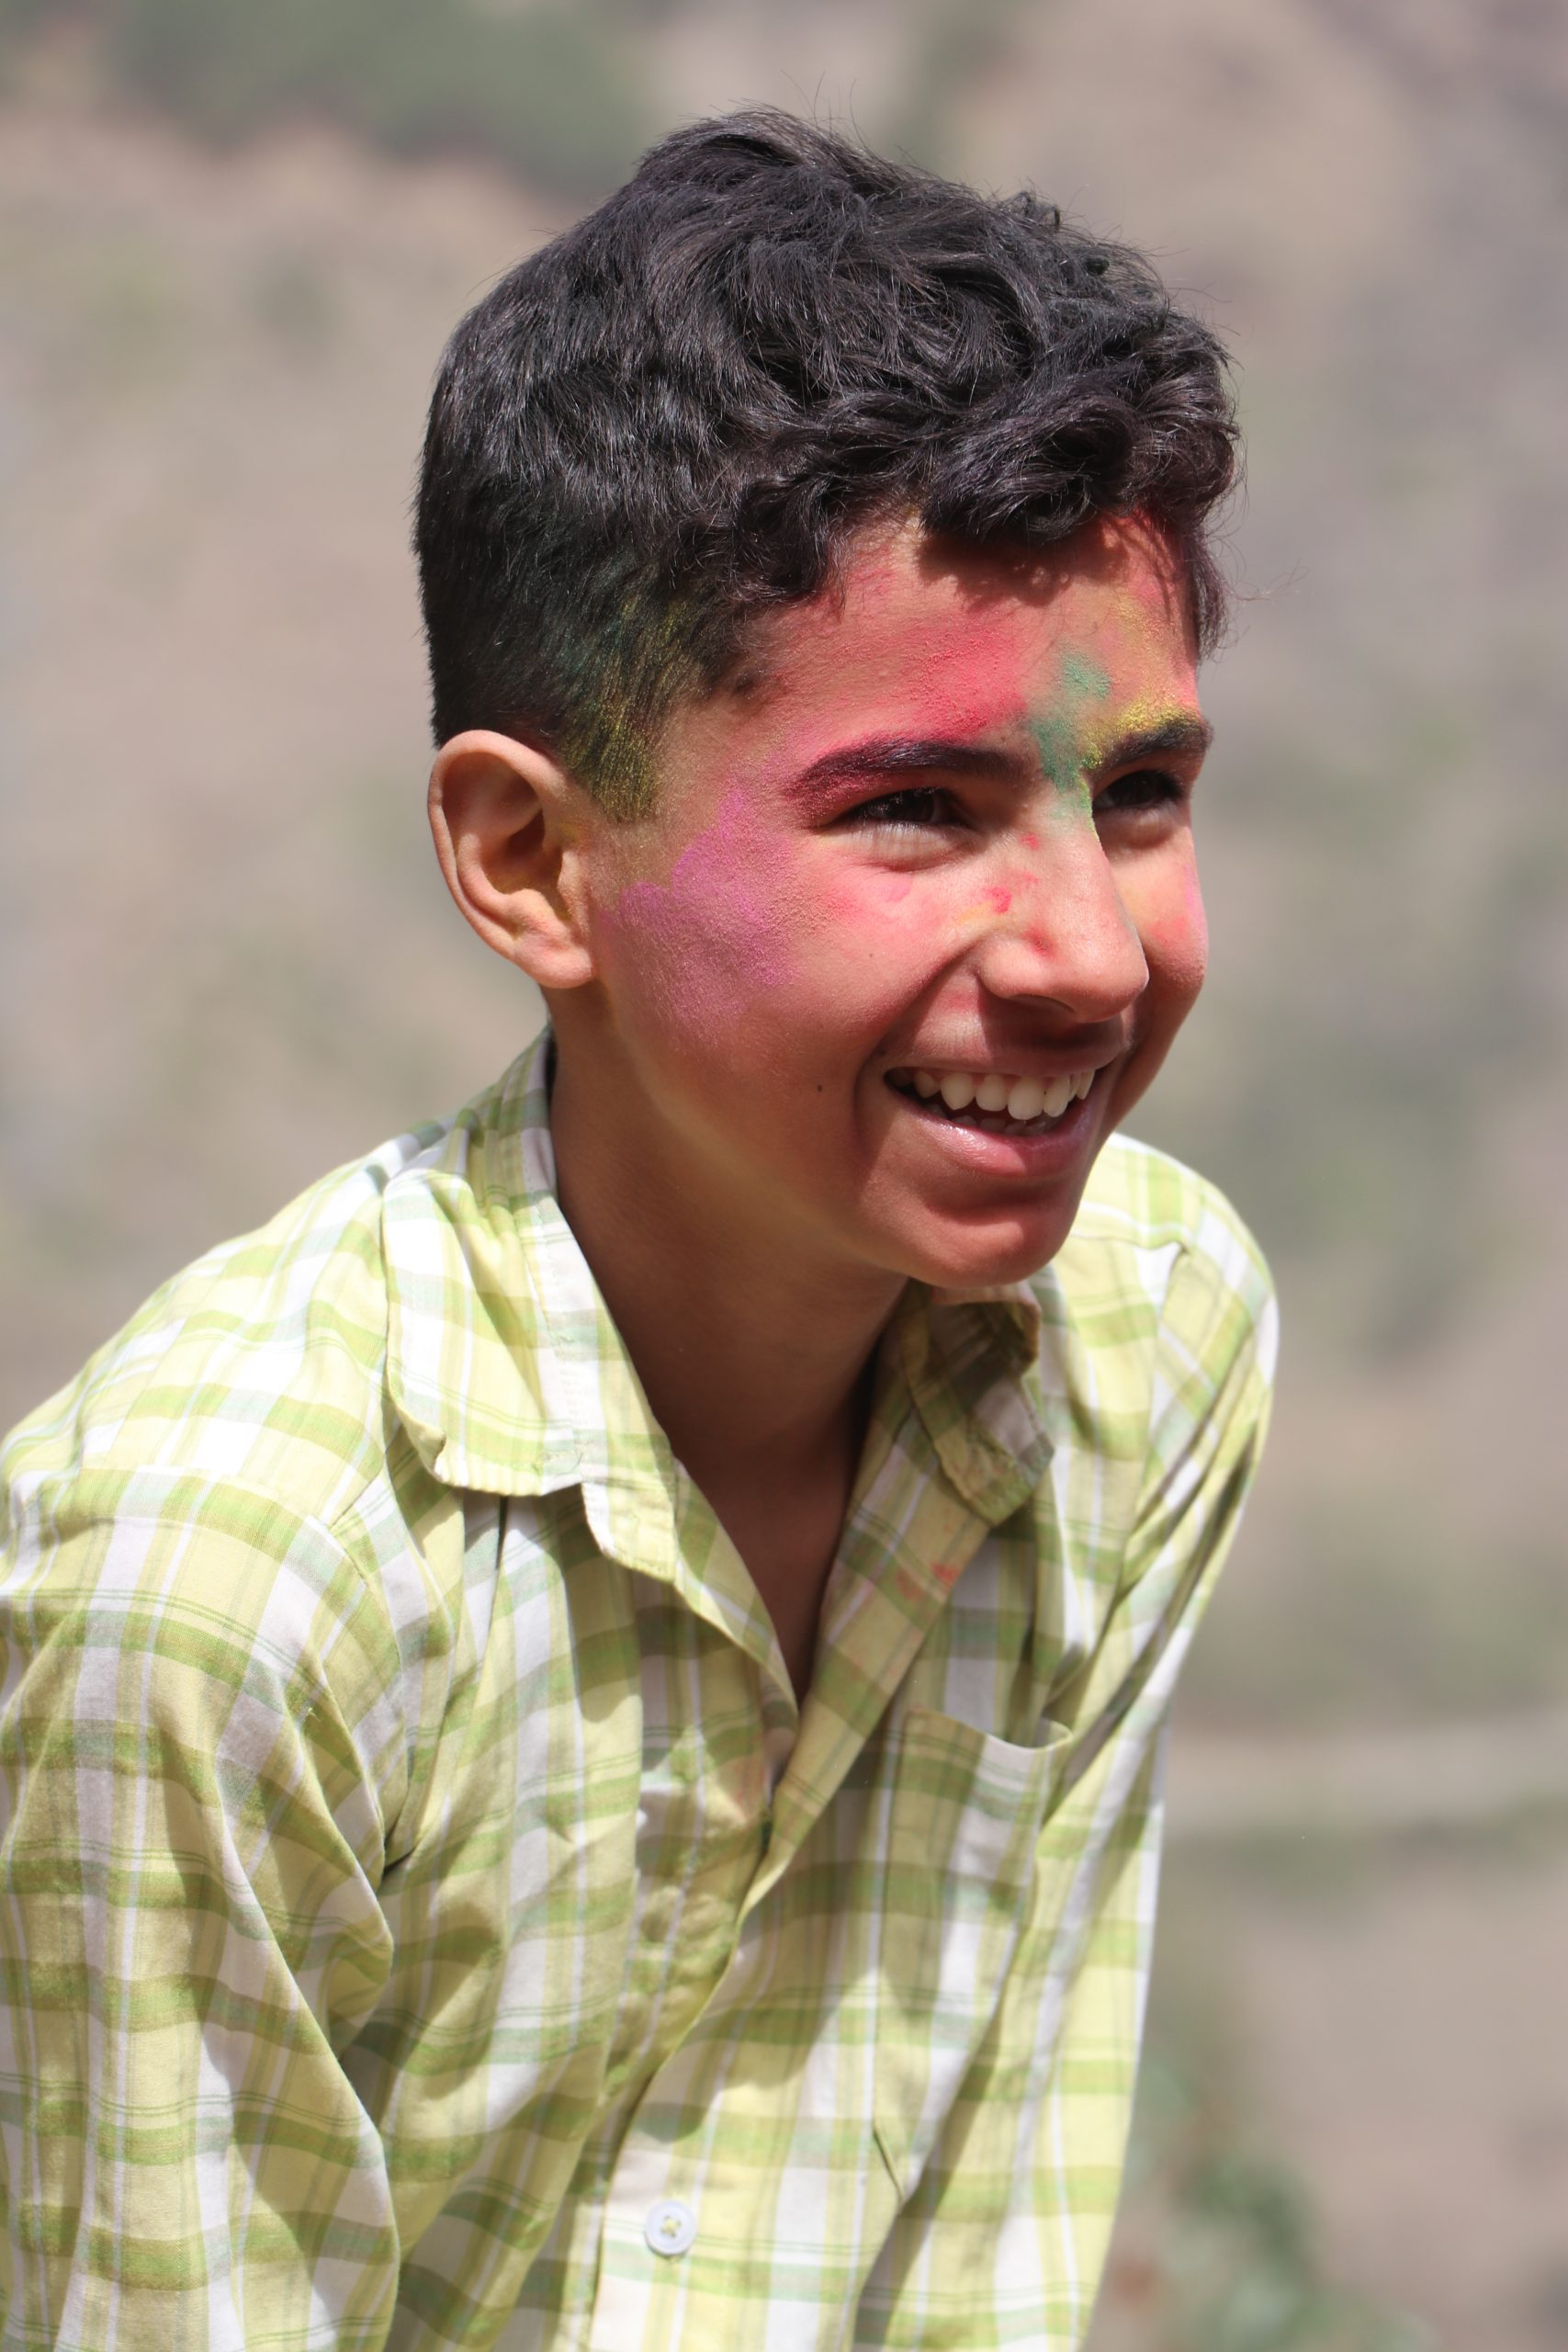 Holi colors on Boy's face